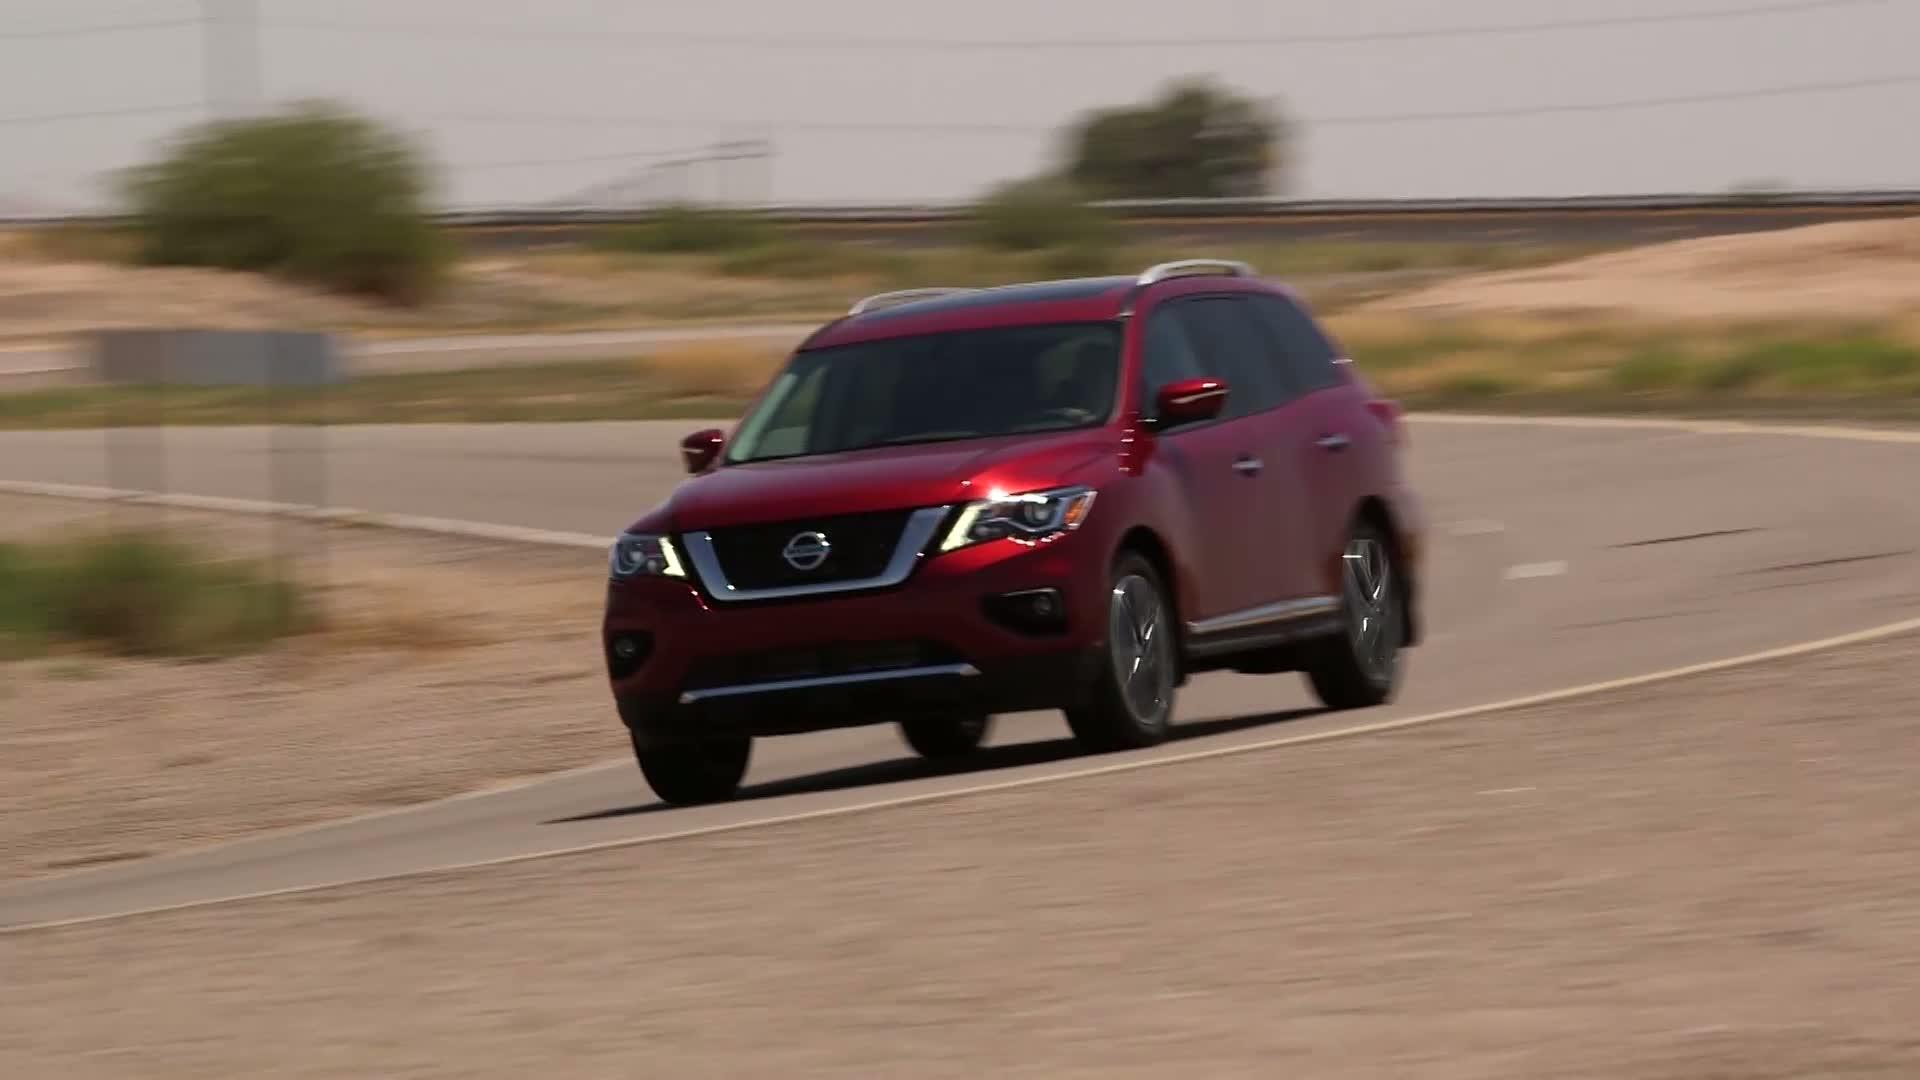 2017 Nissan Pathfinder Towing Capacity >> 2017 Nissan Pathfinder Press Kit